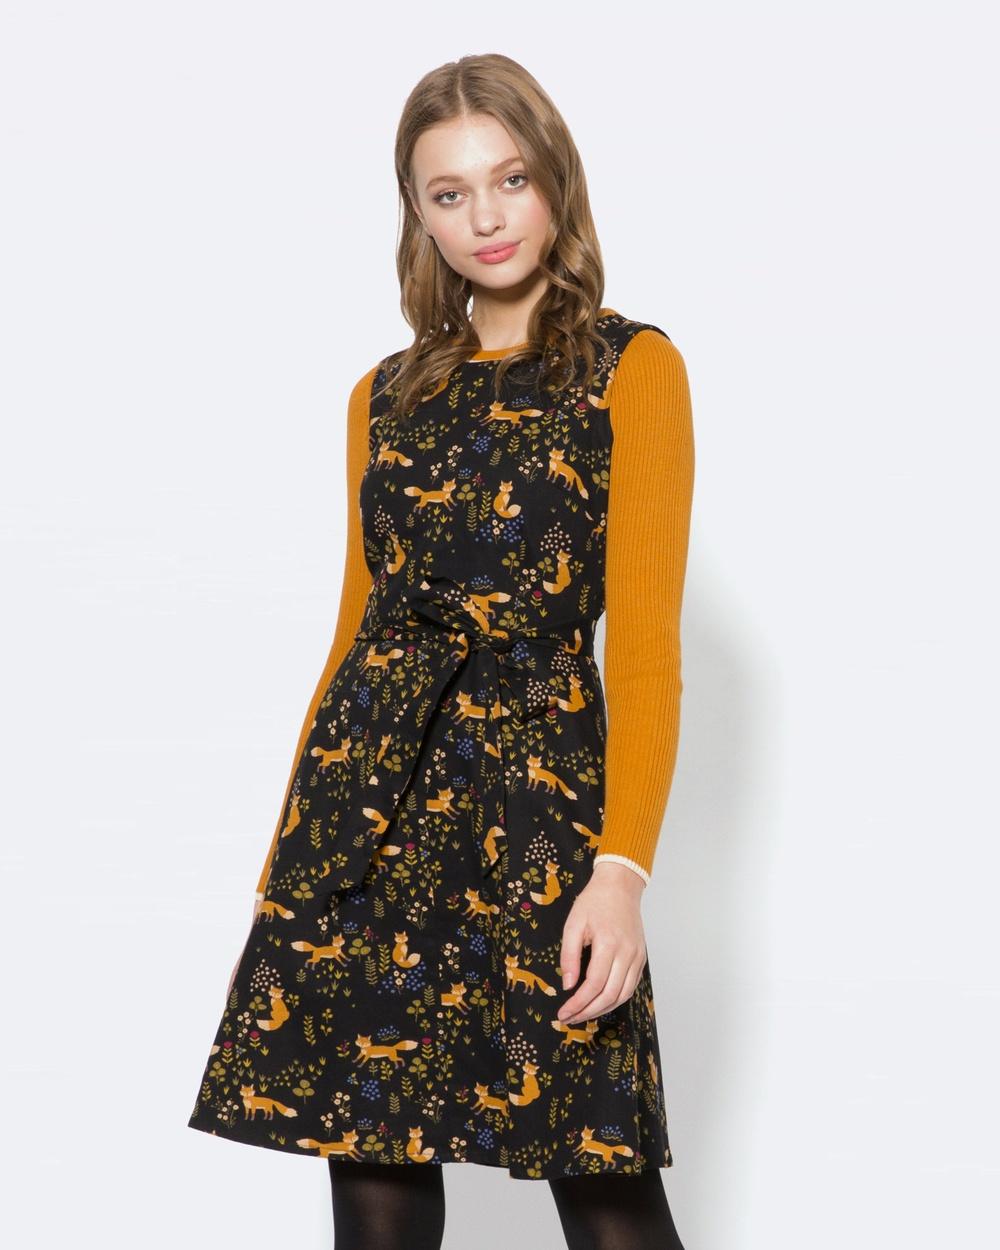 Princess Highway Foxy Loxy Dress Dresses Black Foxy Loxy Dress